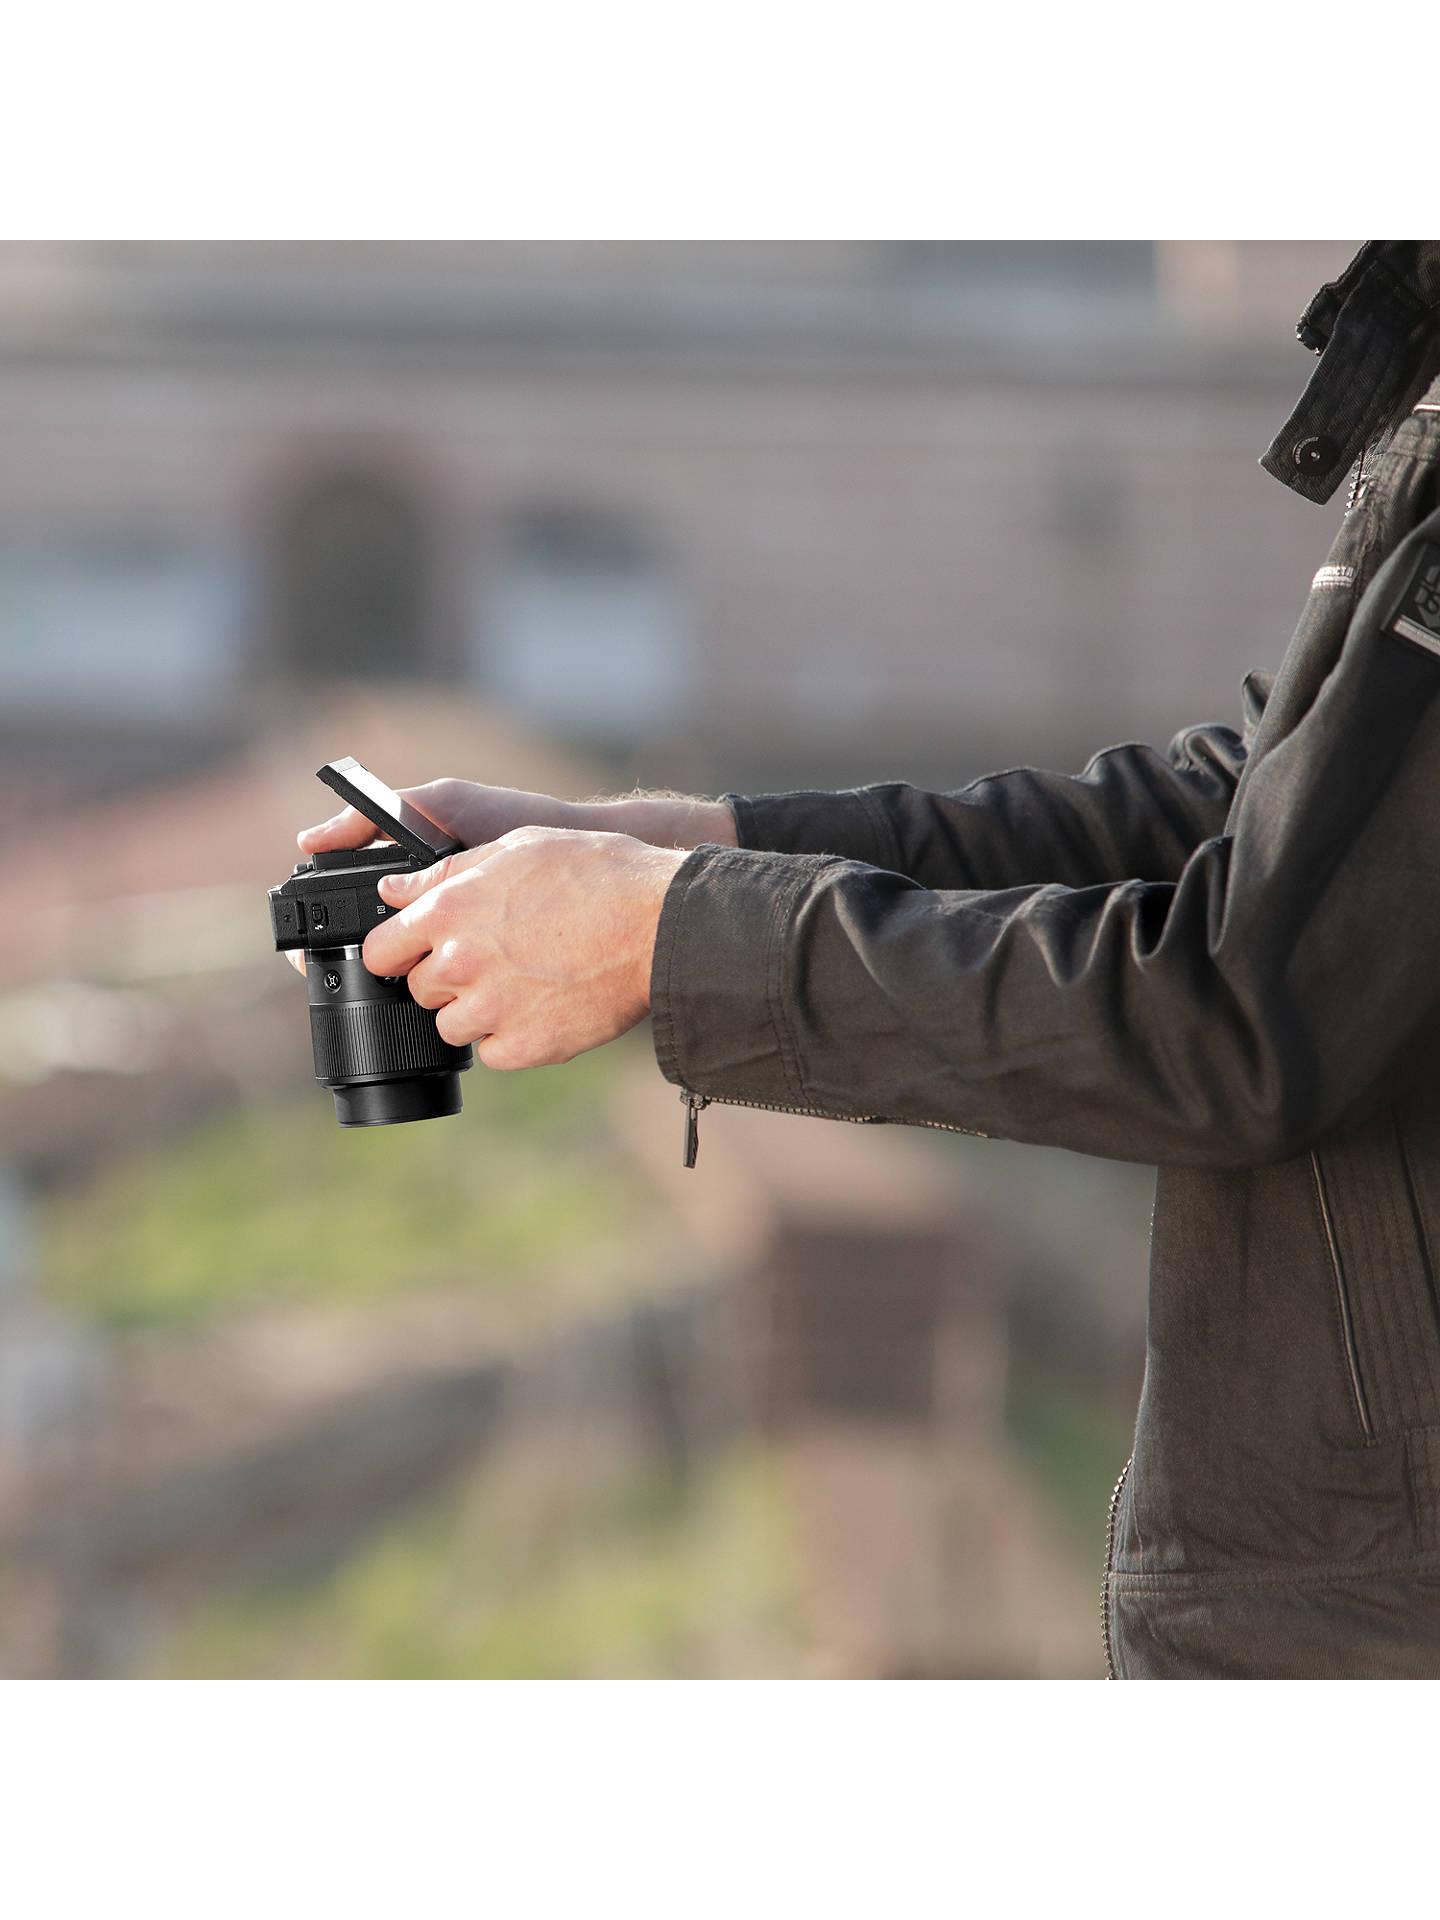 Canon Powershot G3x Compact Digital Camera Hd 1080p 202mp 25x G3 X Wi Fi And Nfc Buycanon Optical Zoom